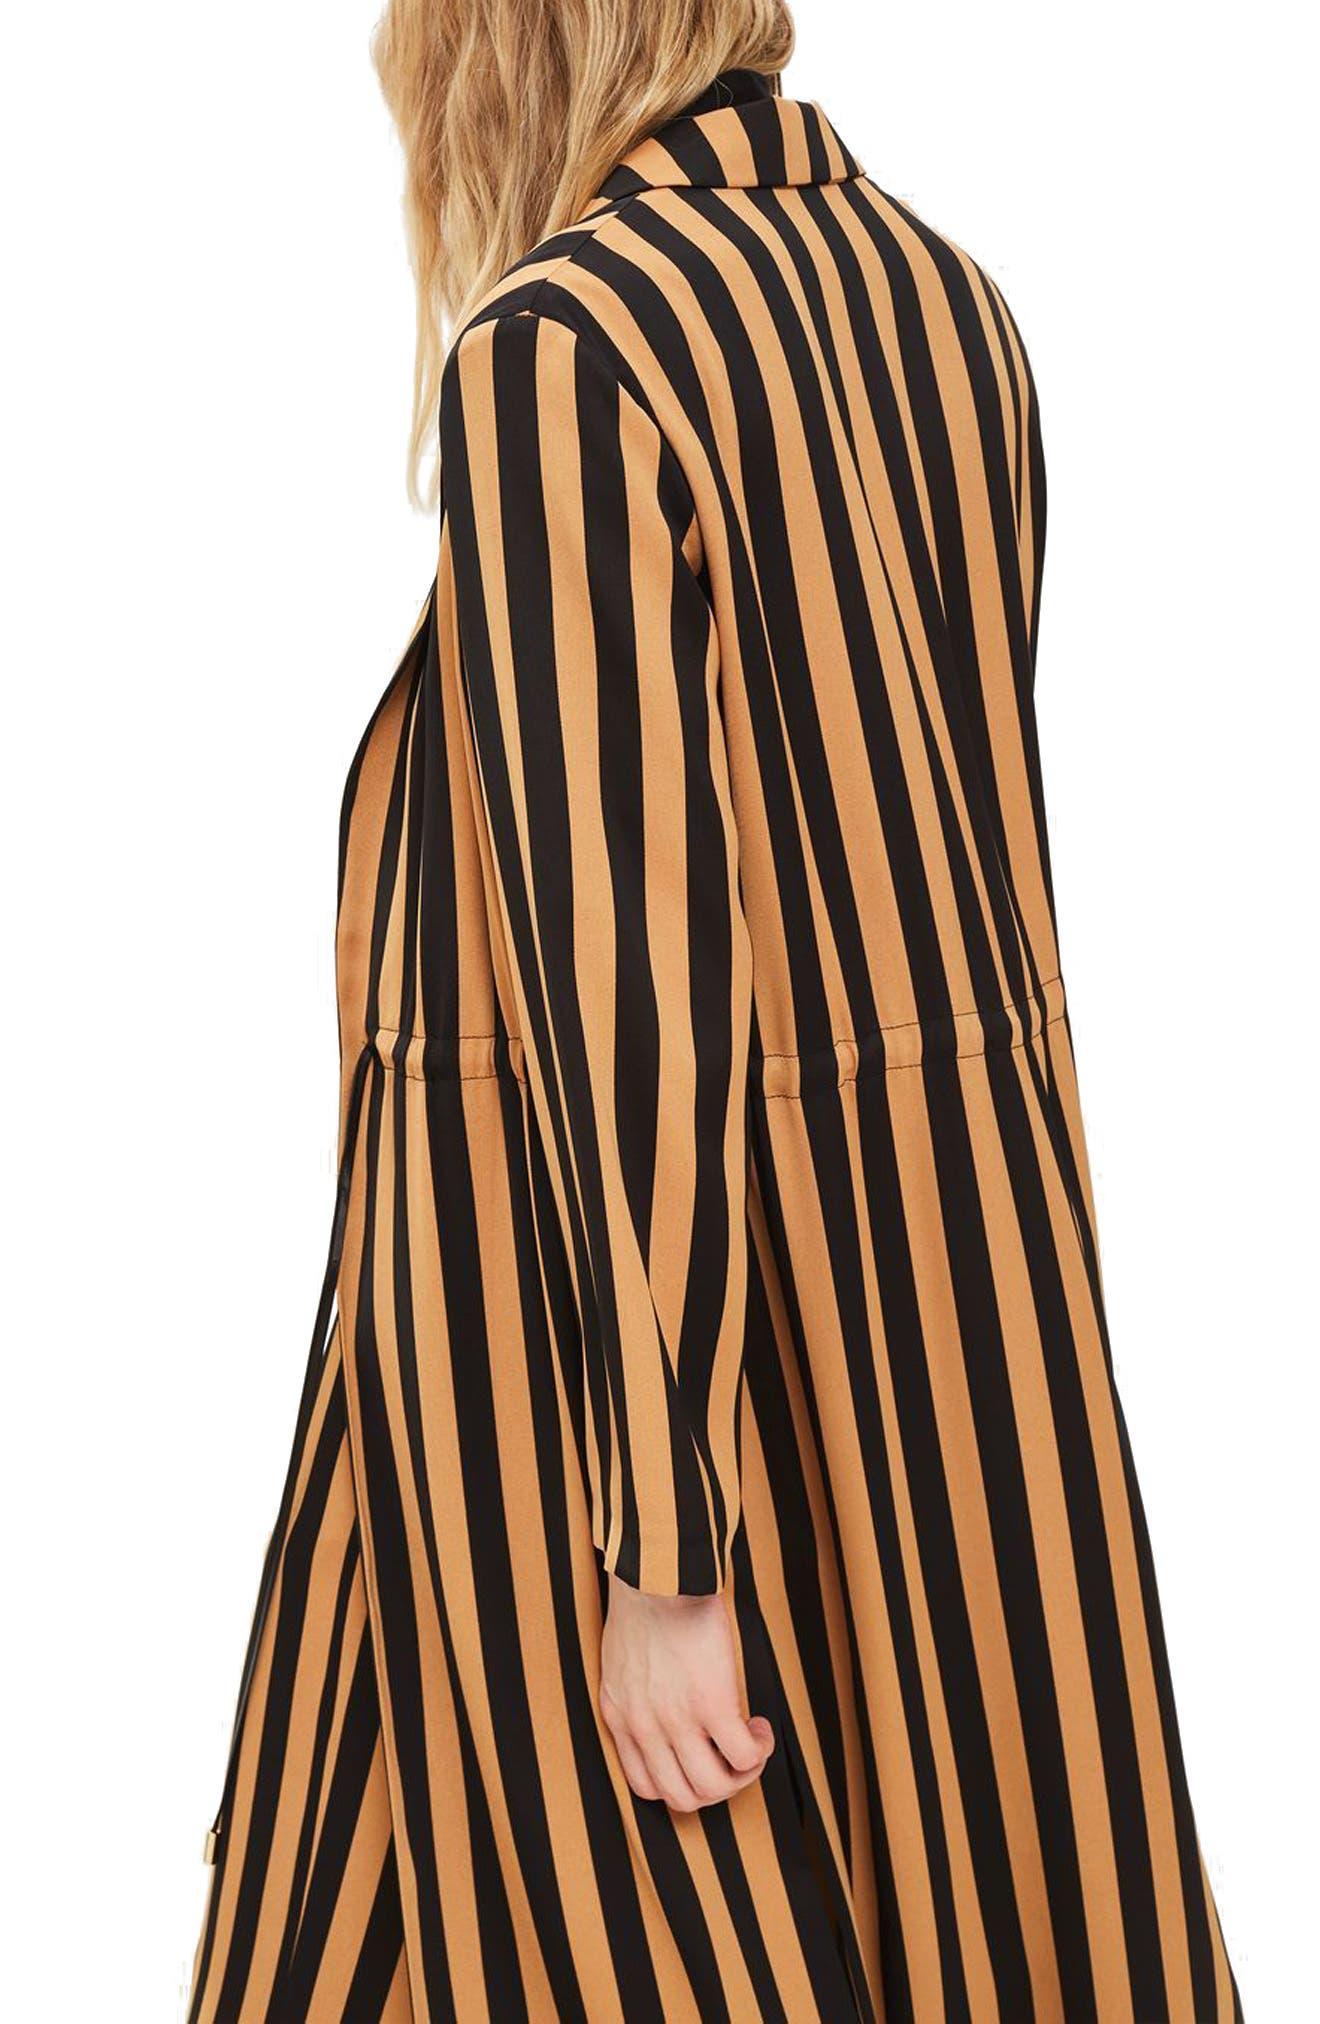 Stripe Duster Jacket,                             Alternate thumbnail 2, color,                             201